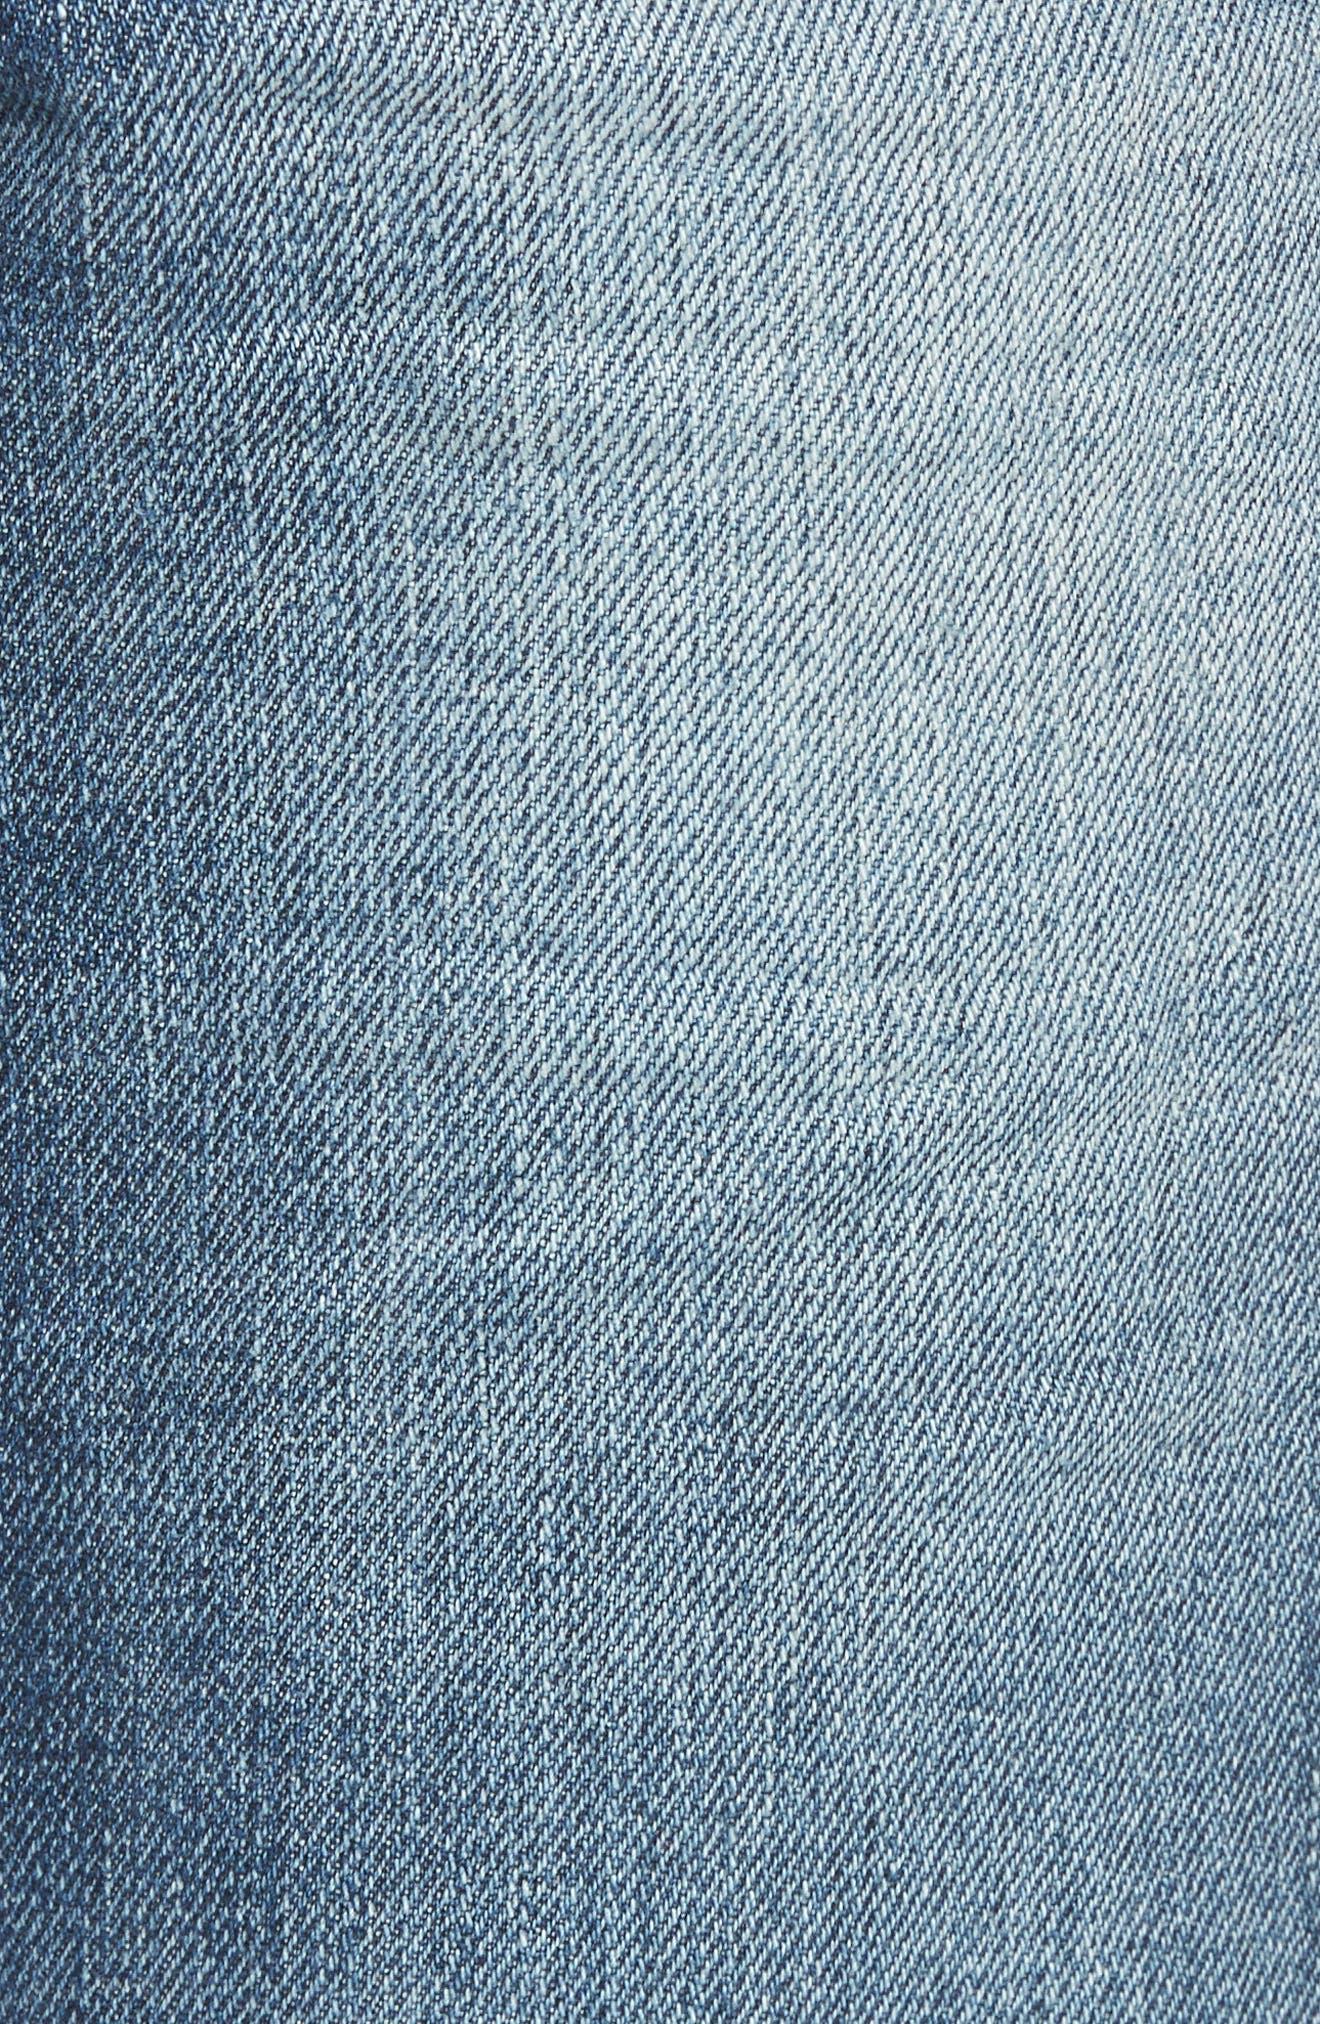 Geno Straight Leg Jeans,                             Alternate thumbnail 5, color,                             Worn Suspect